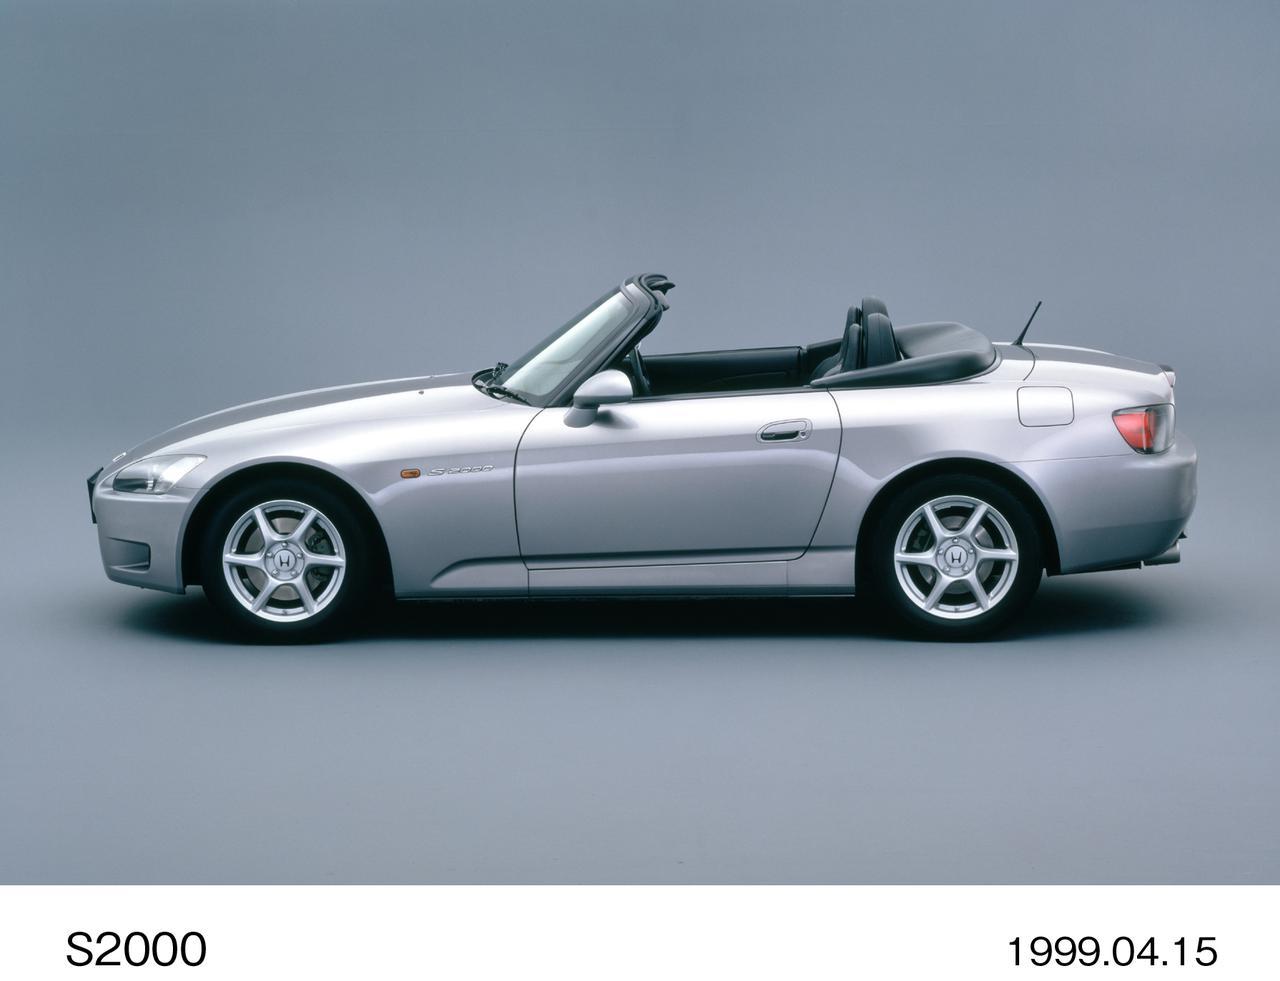 Images : 4番目の画像 - ホンダ S2000関連画像(クリックして拡大) - A Little Honda | ア・リトル・ホンダ(リトホン)